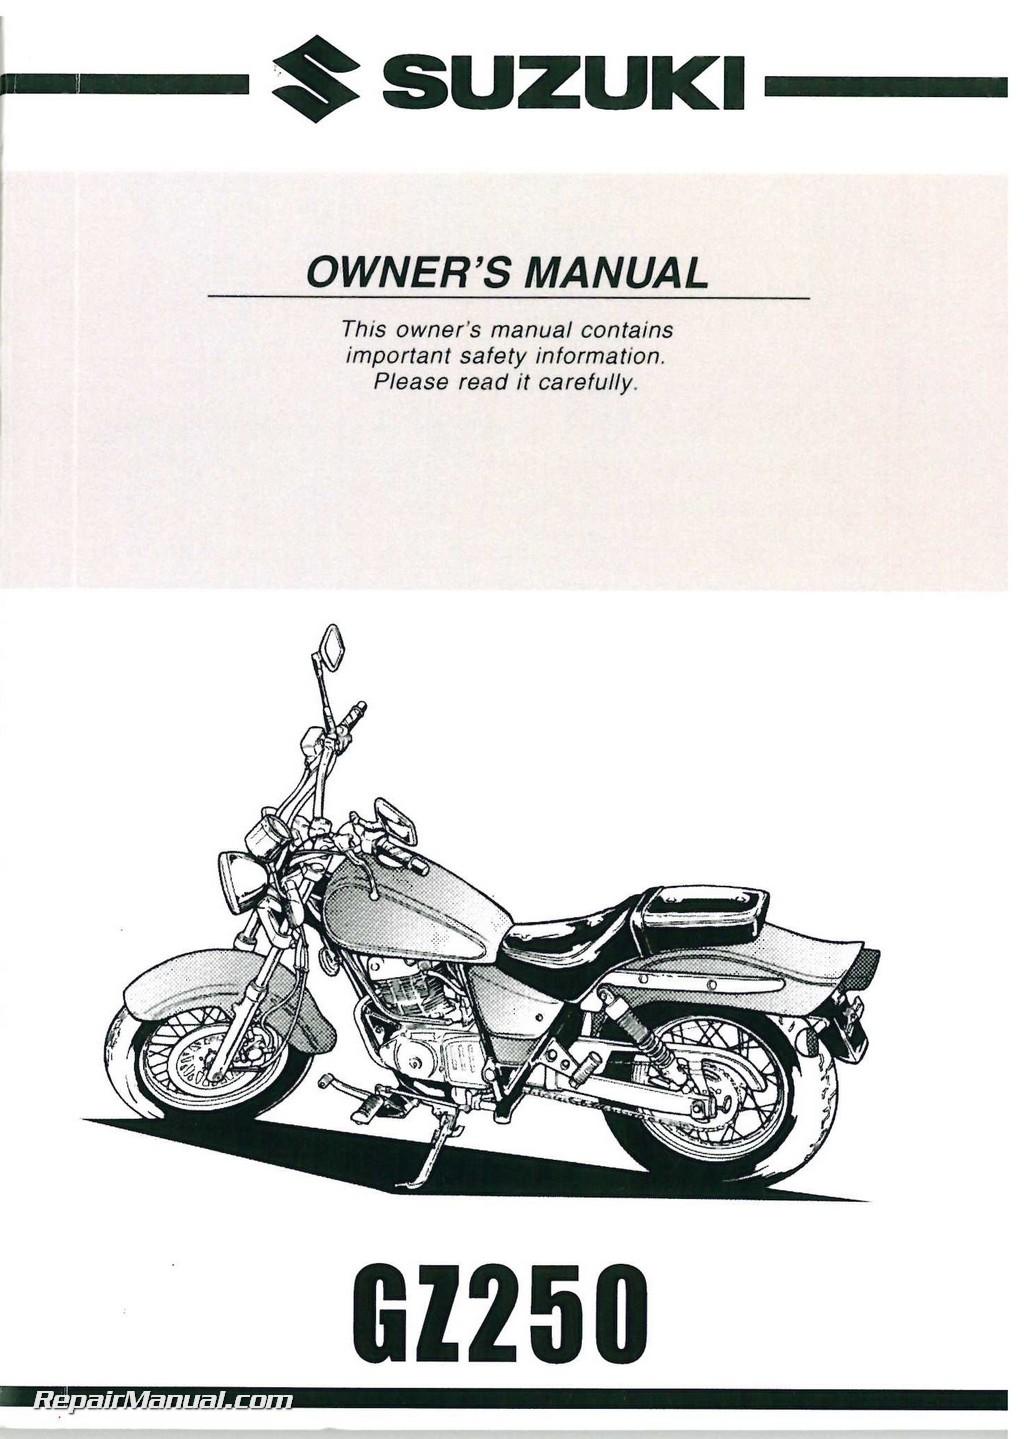 2002 suzuki gsx1400 motorcycle service manual